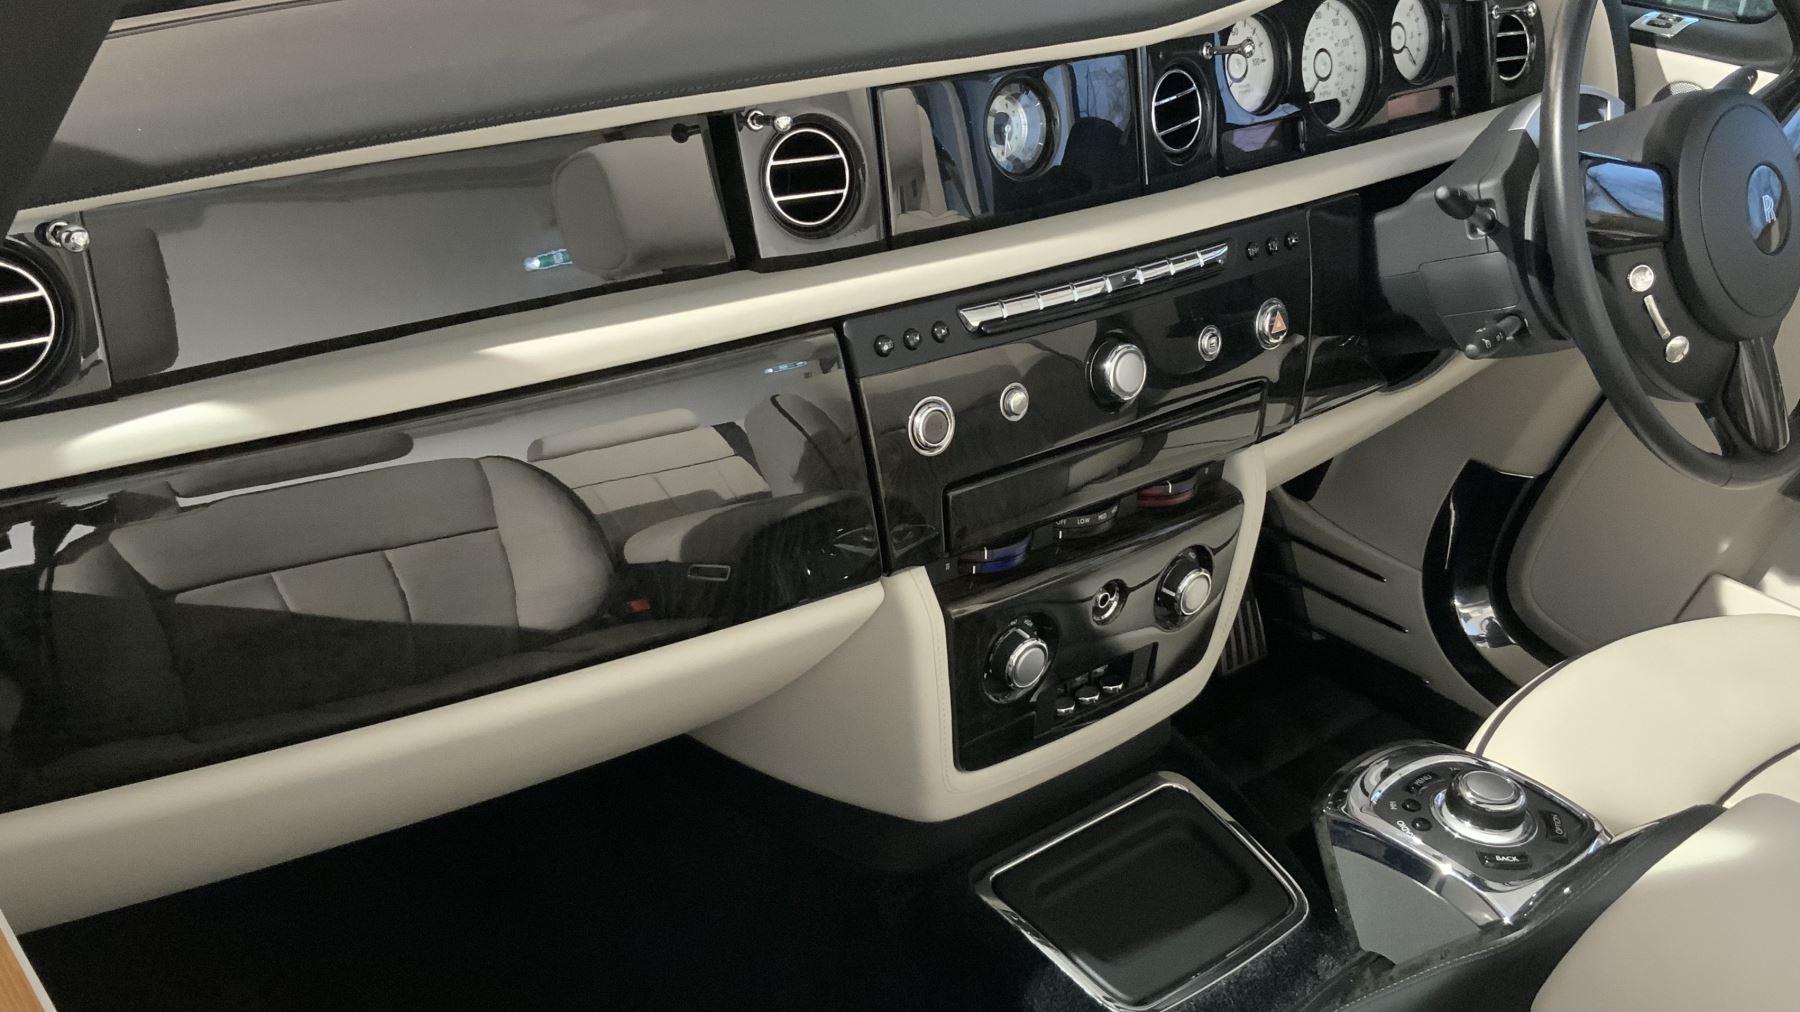 Rolls-Royce Phantom Drophead Coupe Series 2 image 6